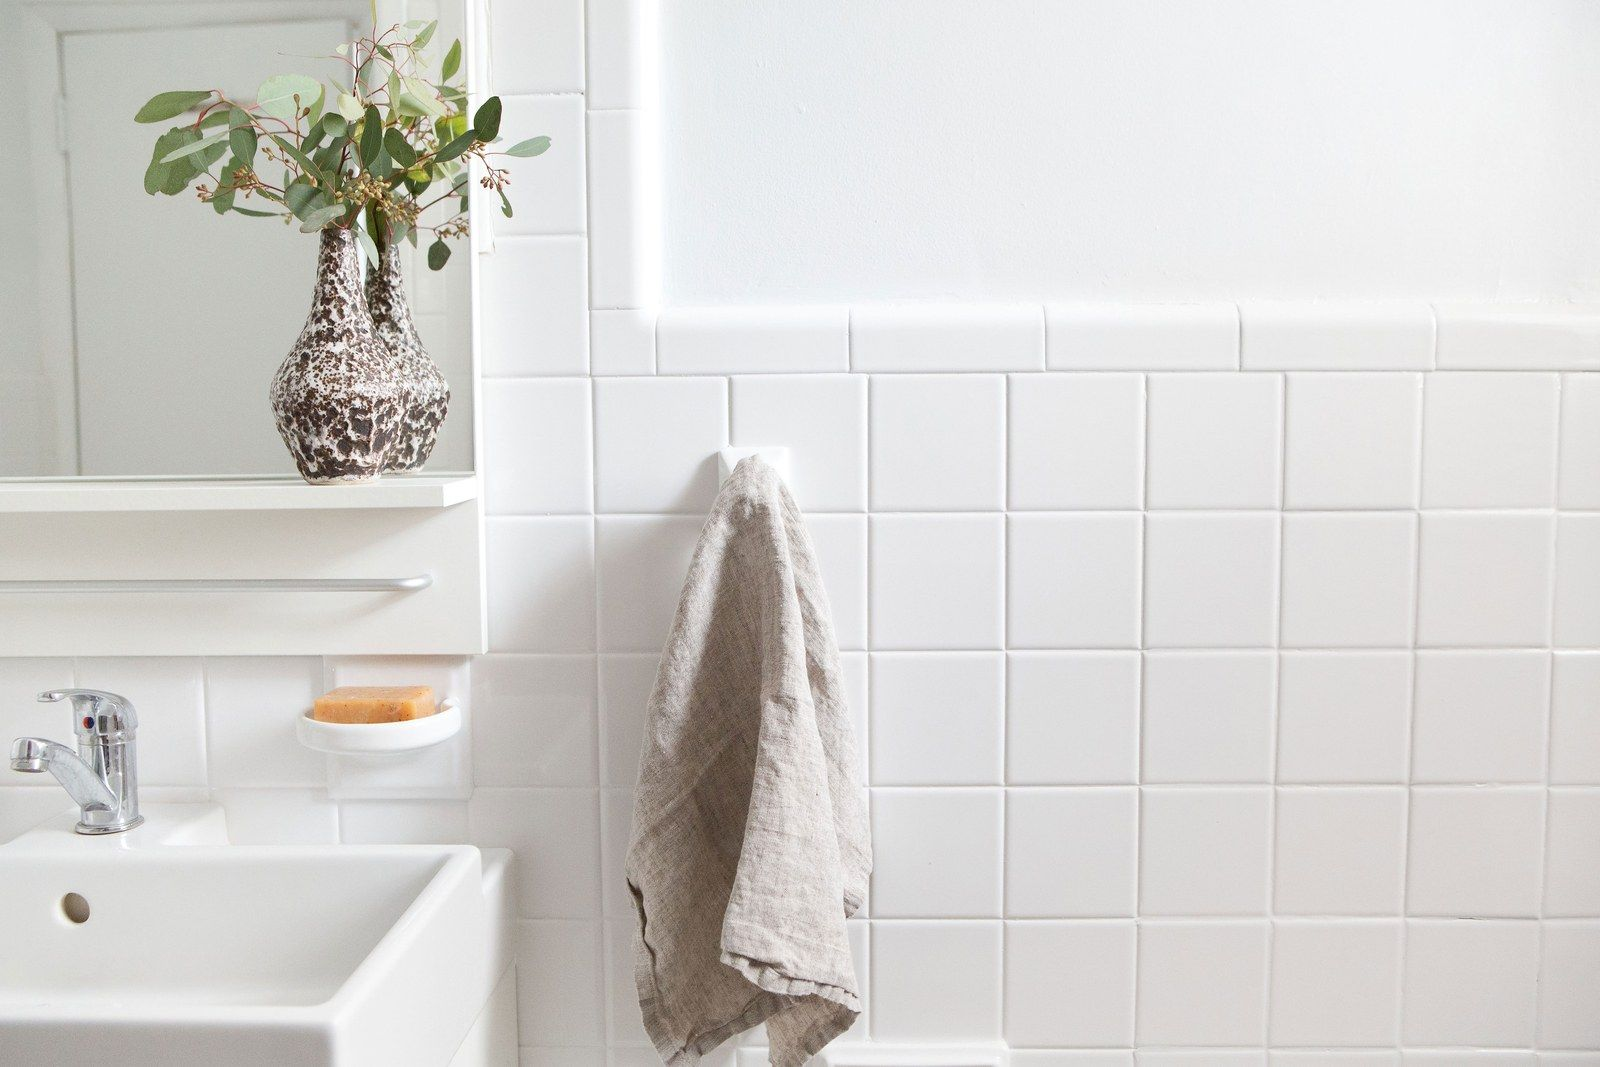 Nj Bathroom Shower Tile Reglazing Refinishing Resurfacing Jemco Reglazers Provide Expert Tilere Shower Tile Bathroom Shower Tile Bathroom Shower Panels